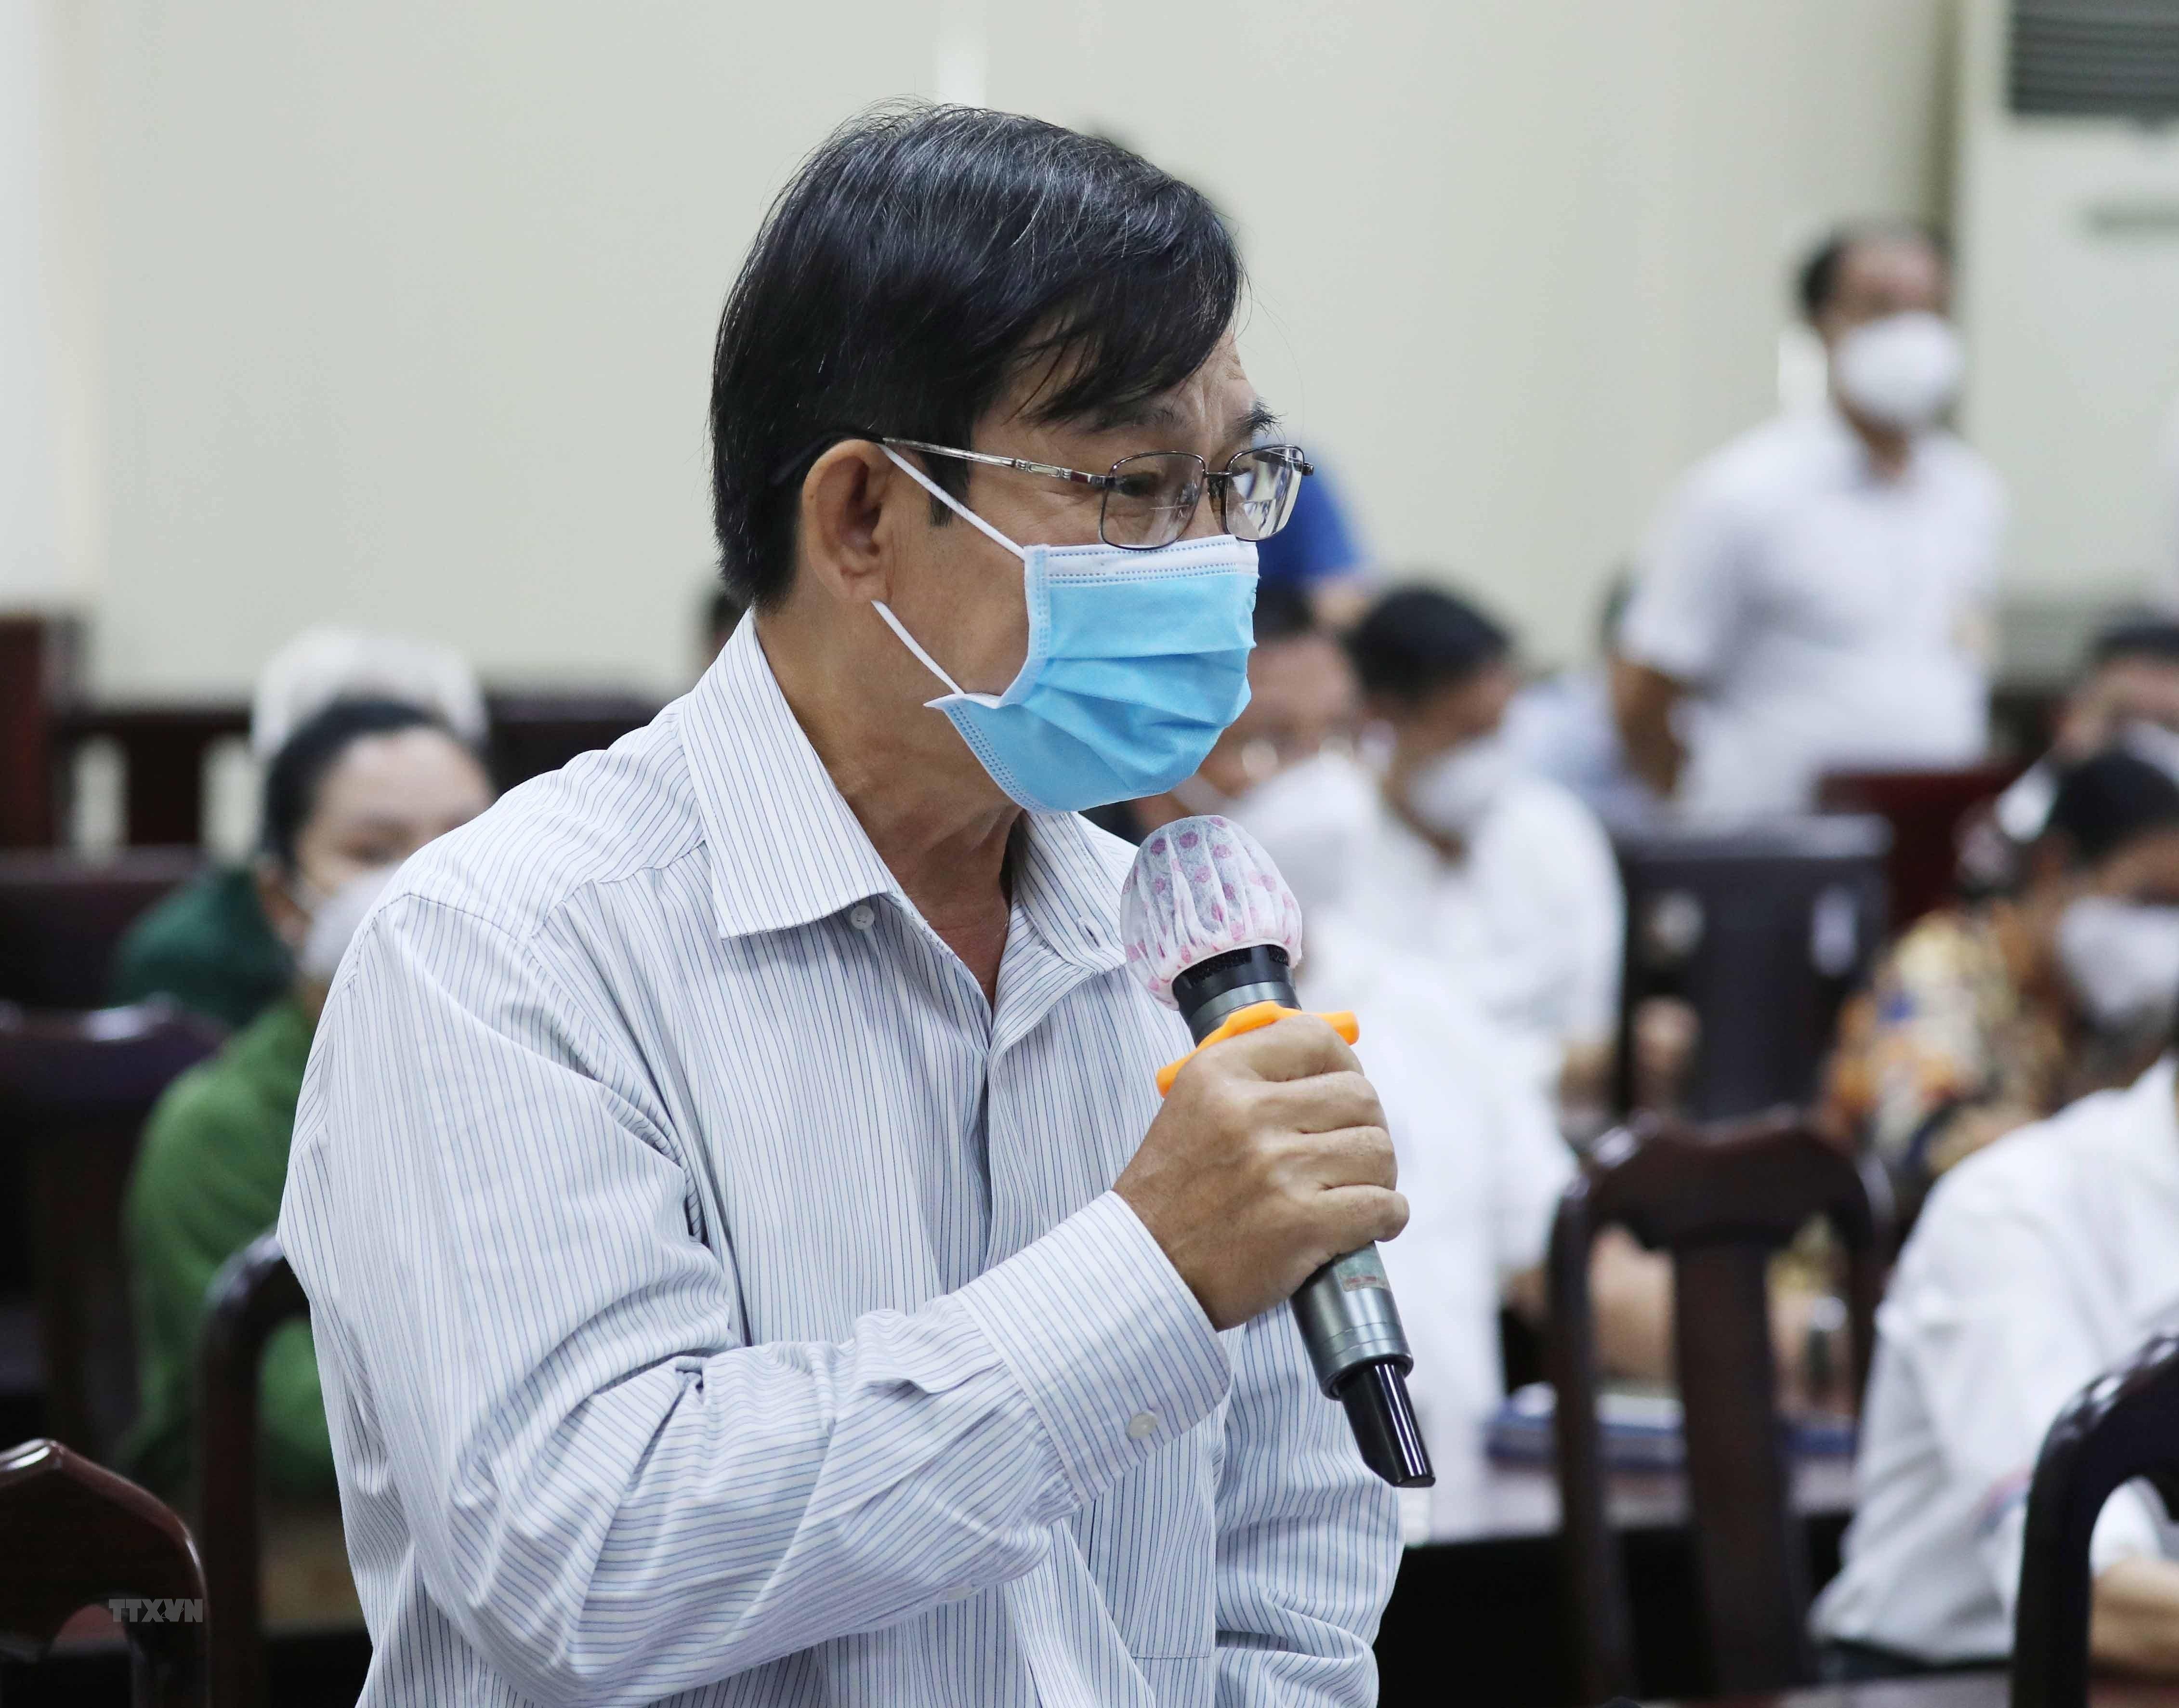 [Photo] Chu tich nuoc Nguyen Xuan Phuc tiep xuc cu tri huyen Hoc Mon hinh anh 4